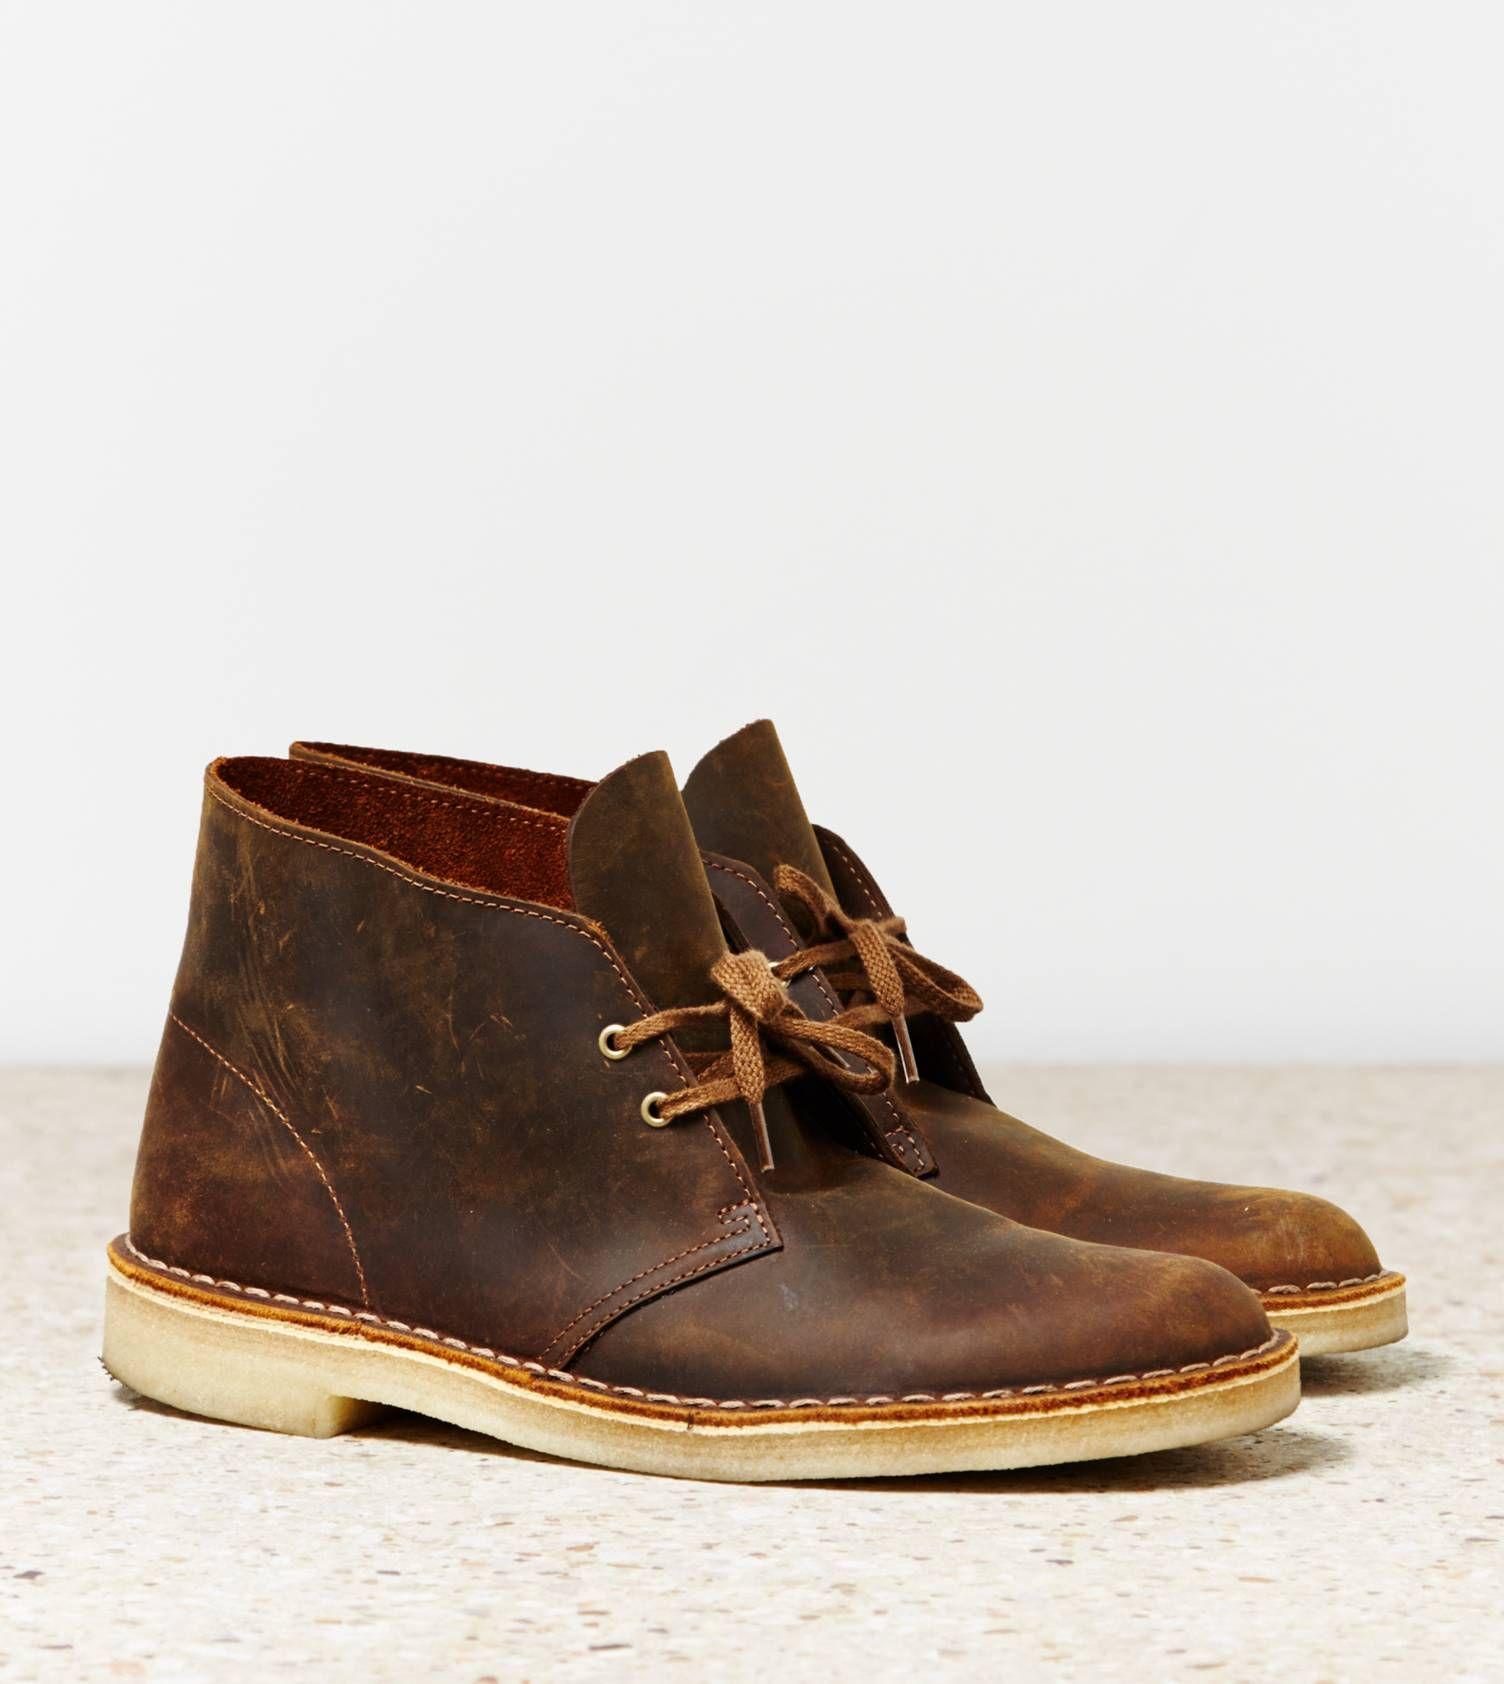 AEO Lug Sole Derby Boot   Men s Fashion   Desert boots, Clarks ... cd79f07f93f2